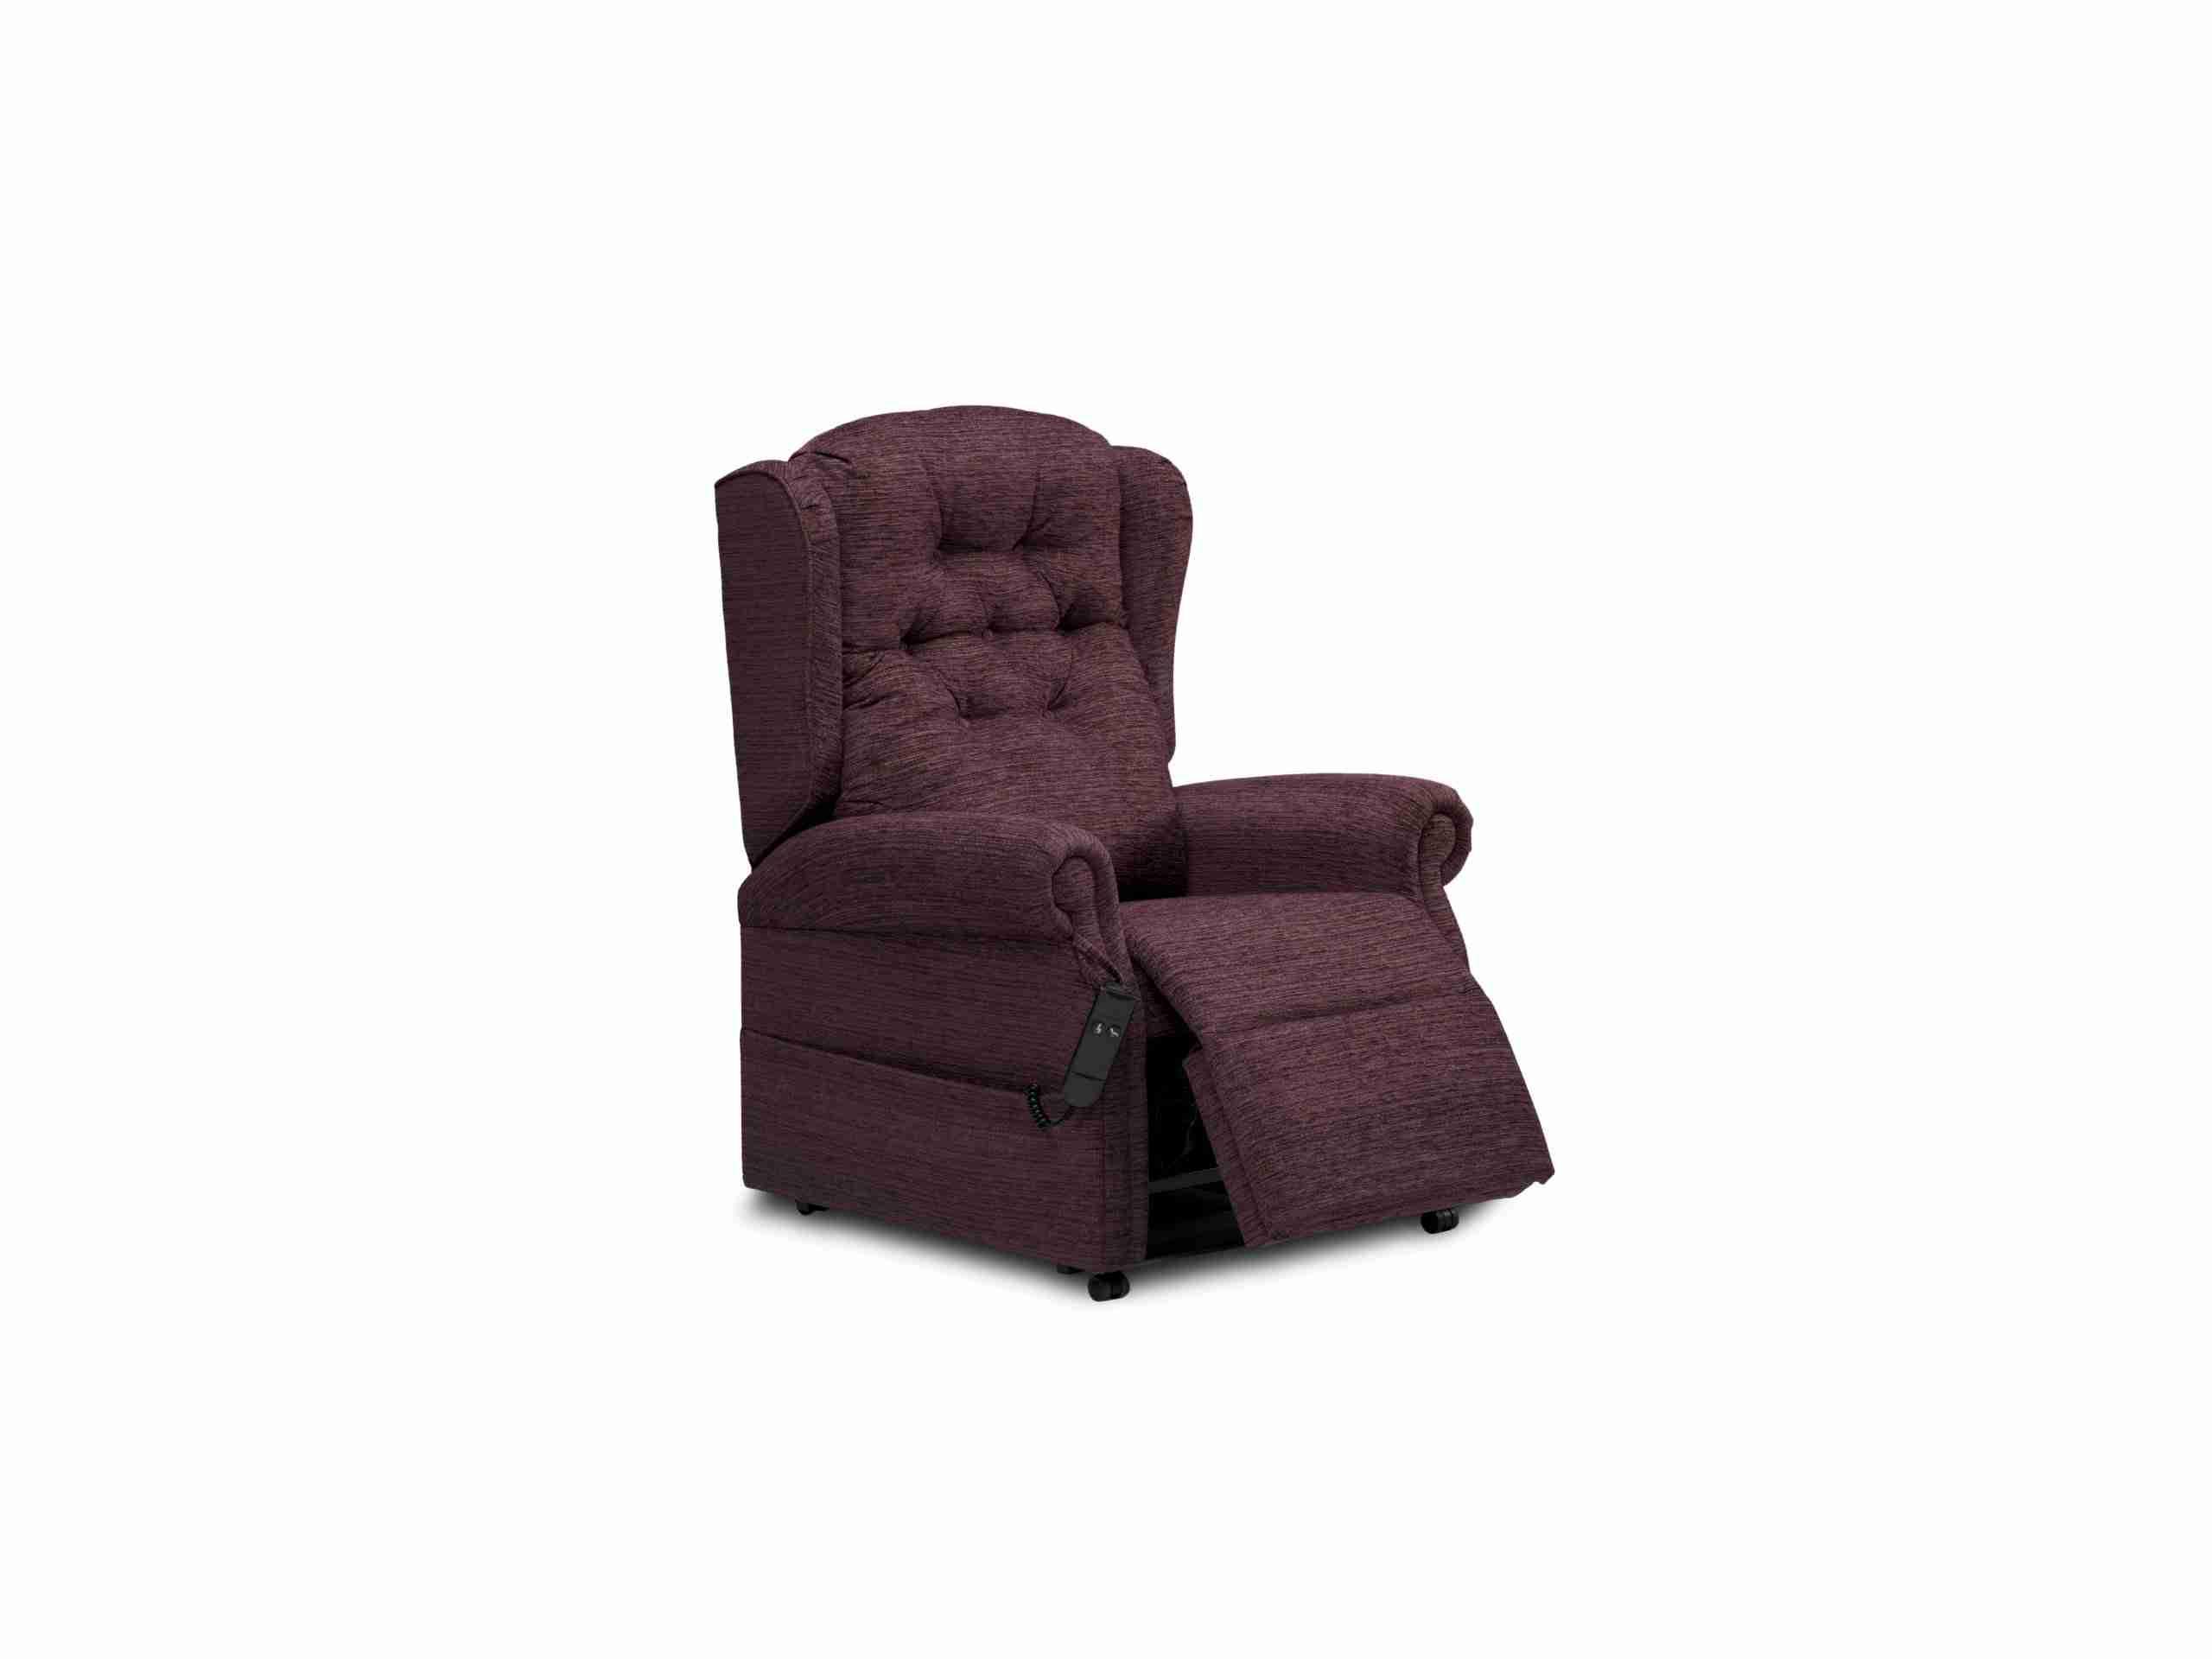 Marbella Chair Repose03